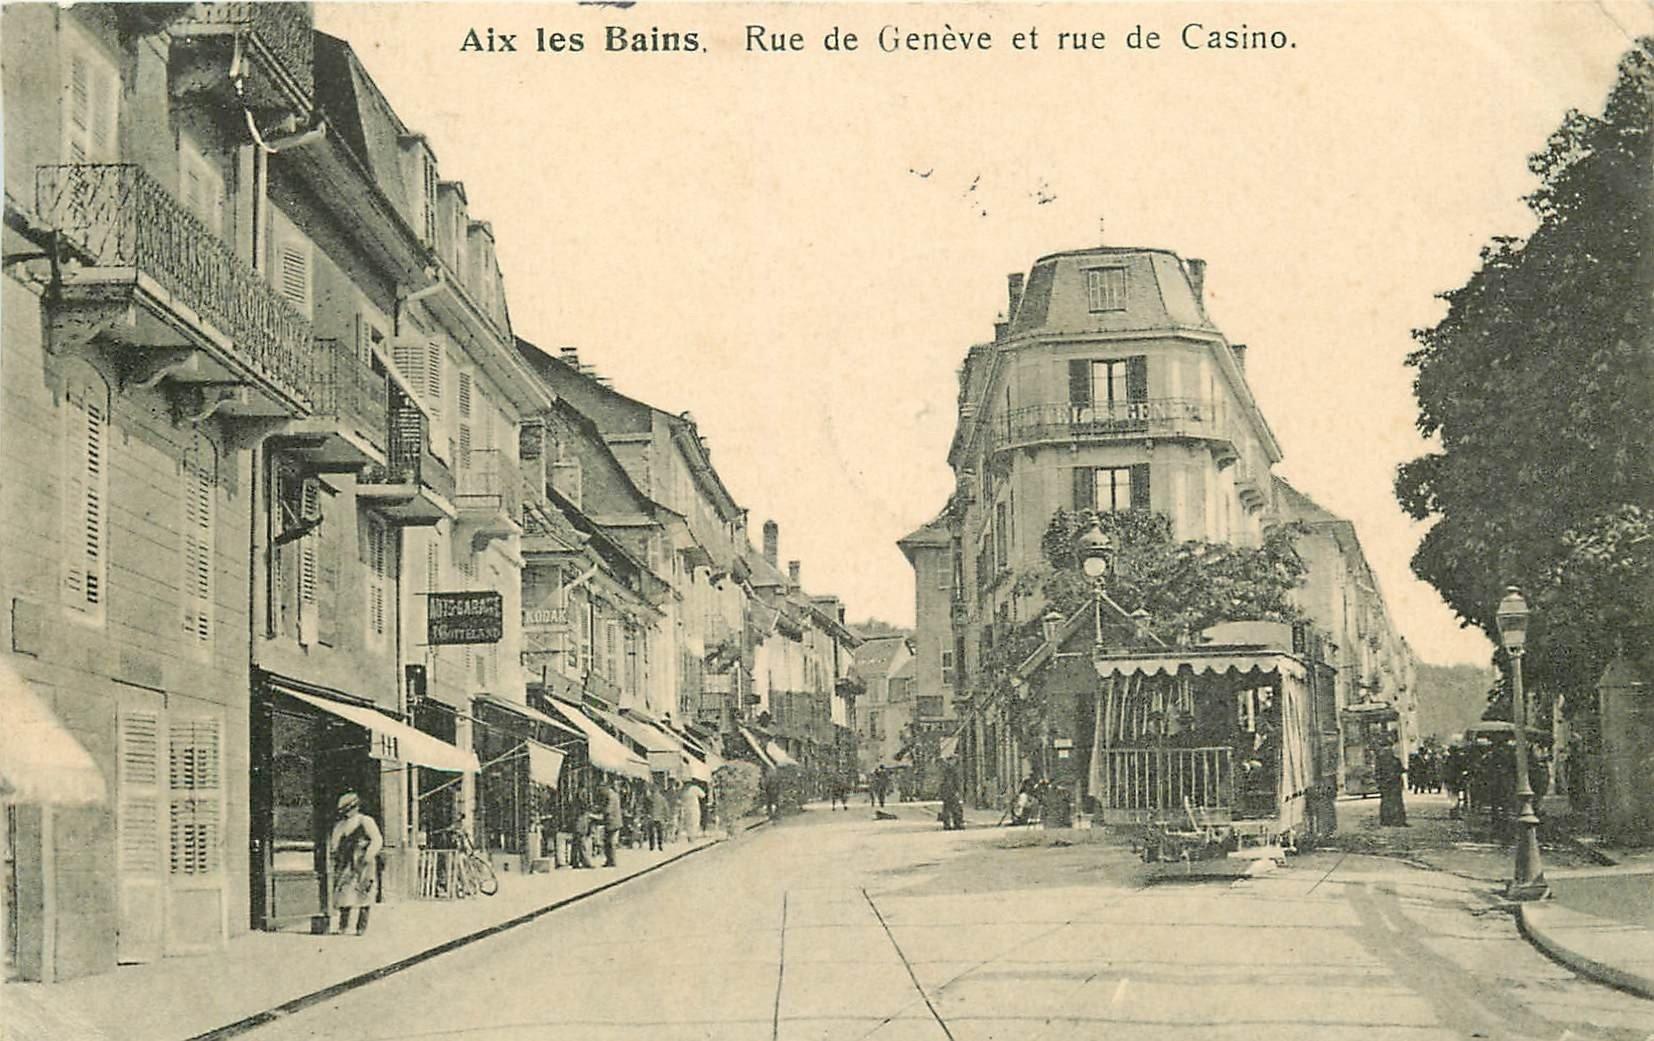 73 AIX-LES-BAINS. Tramway devant Hôtel de Genève rue de Casino 1905